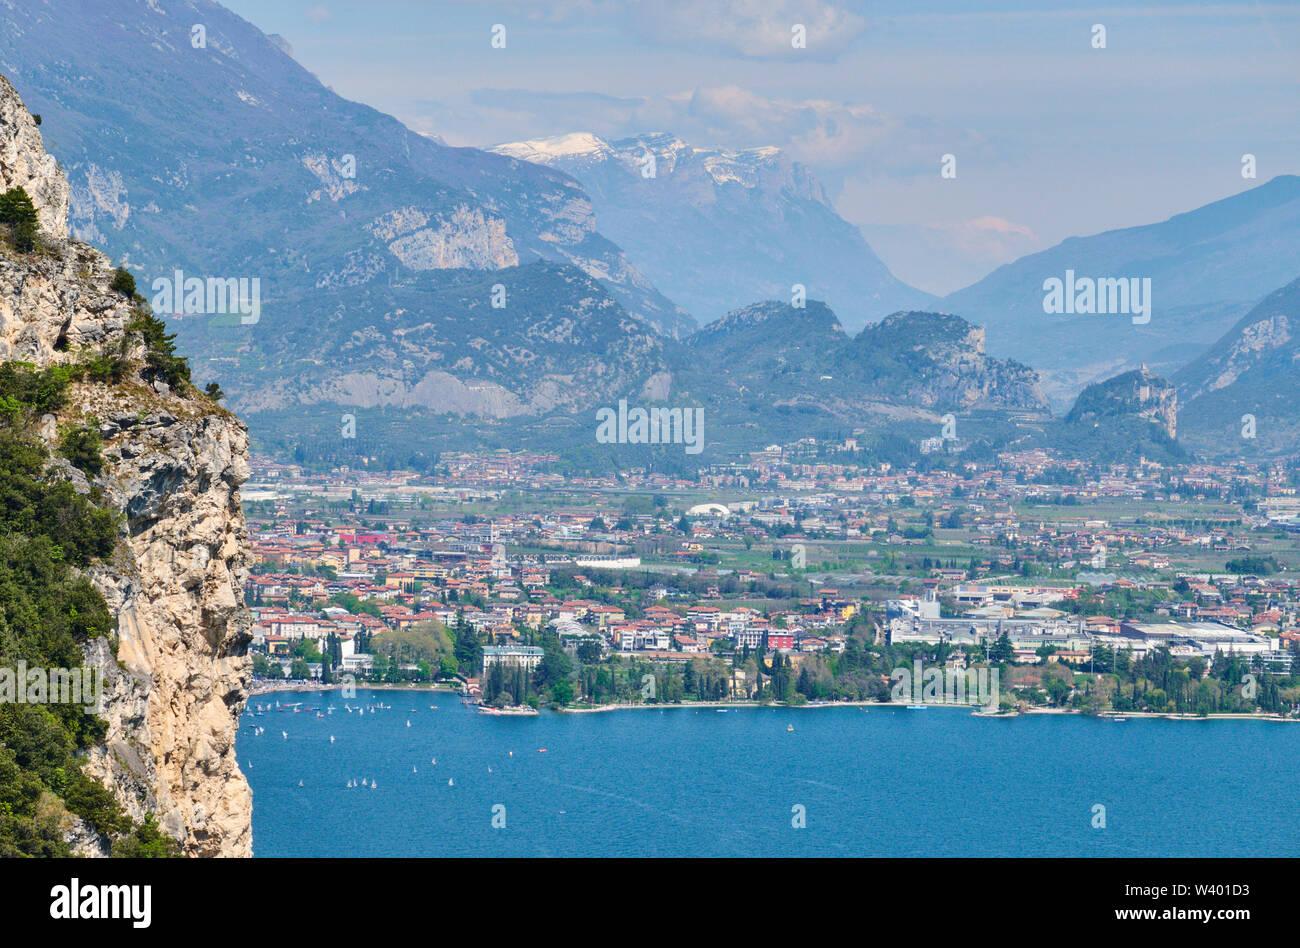 City of Riva del Garda at Lago di Garda, Lake Garda in Torbole - Nago, Riva, Trentino , Italy at April 17, 2019. © Peter Schatz / Alamy Stock Photos - Stock Image